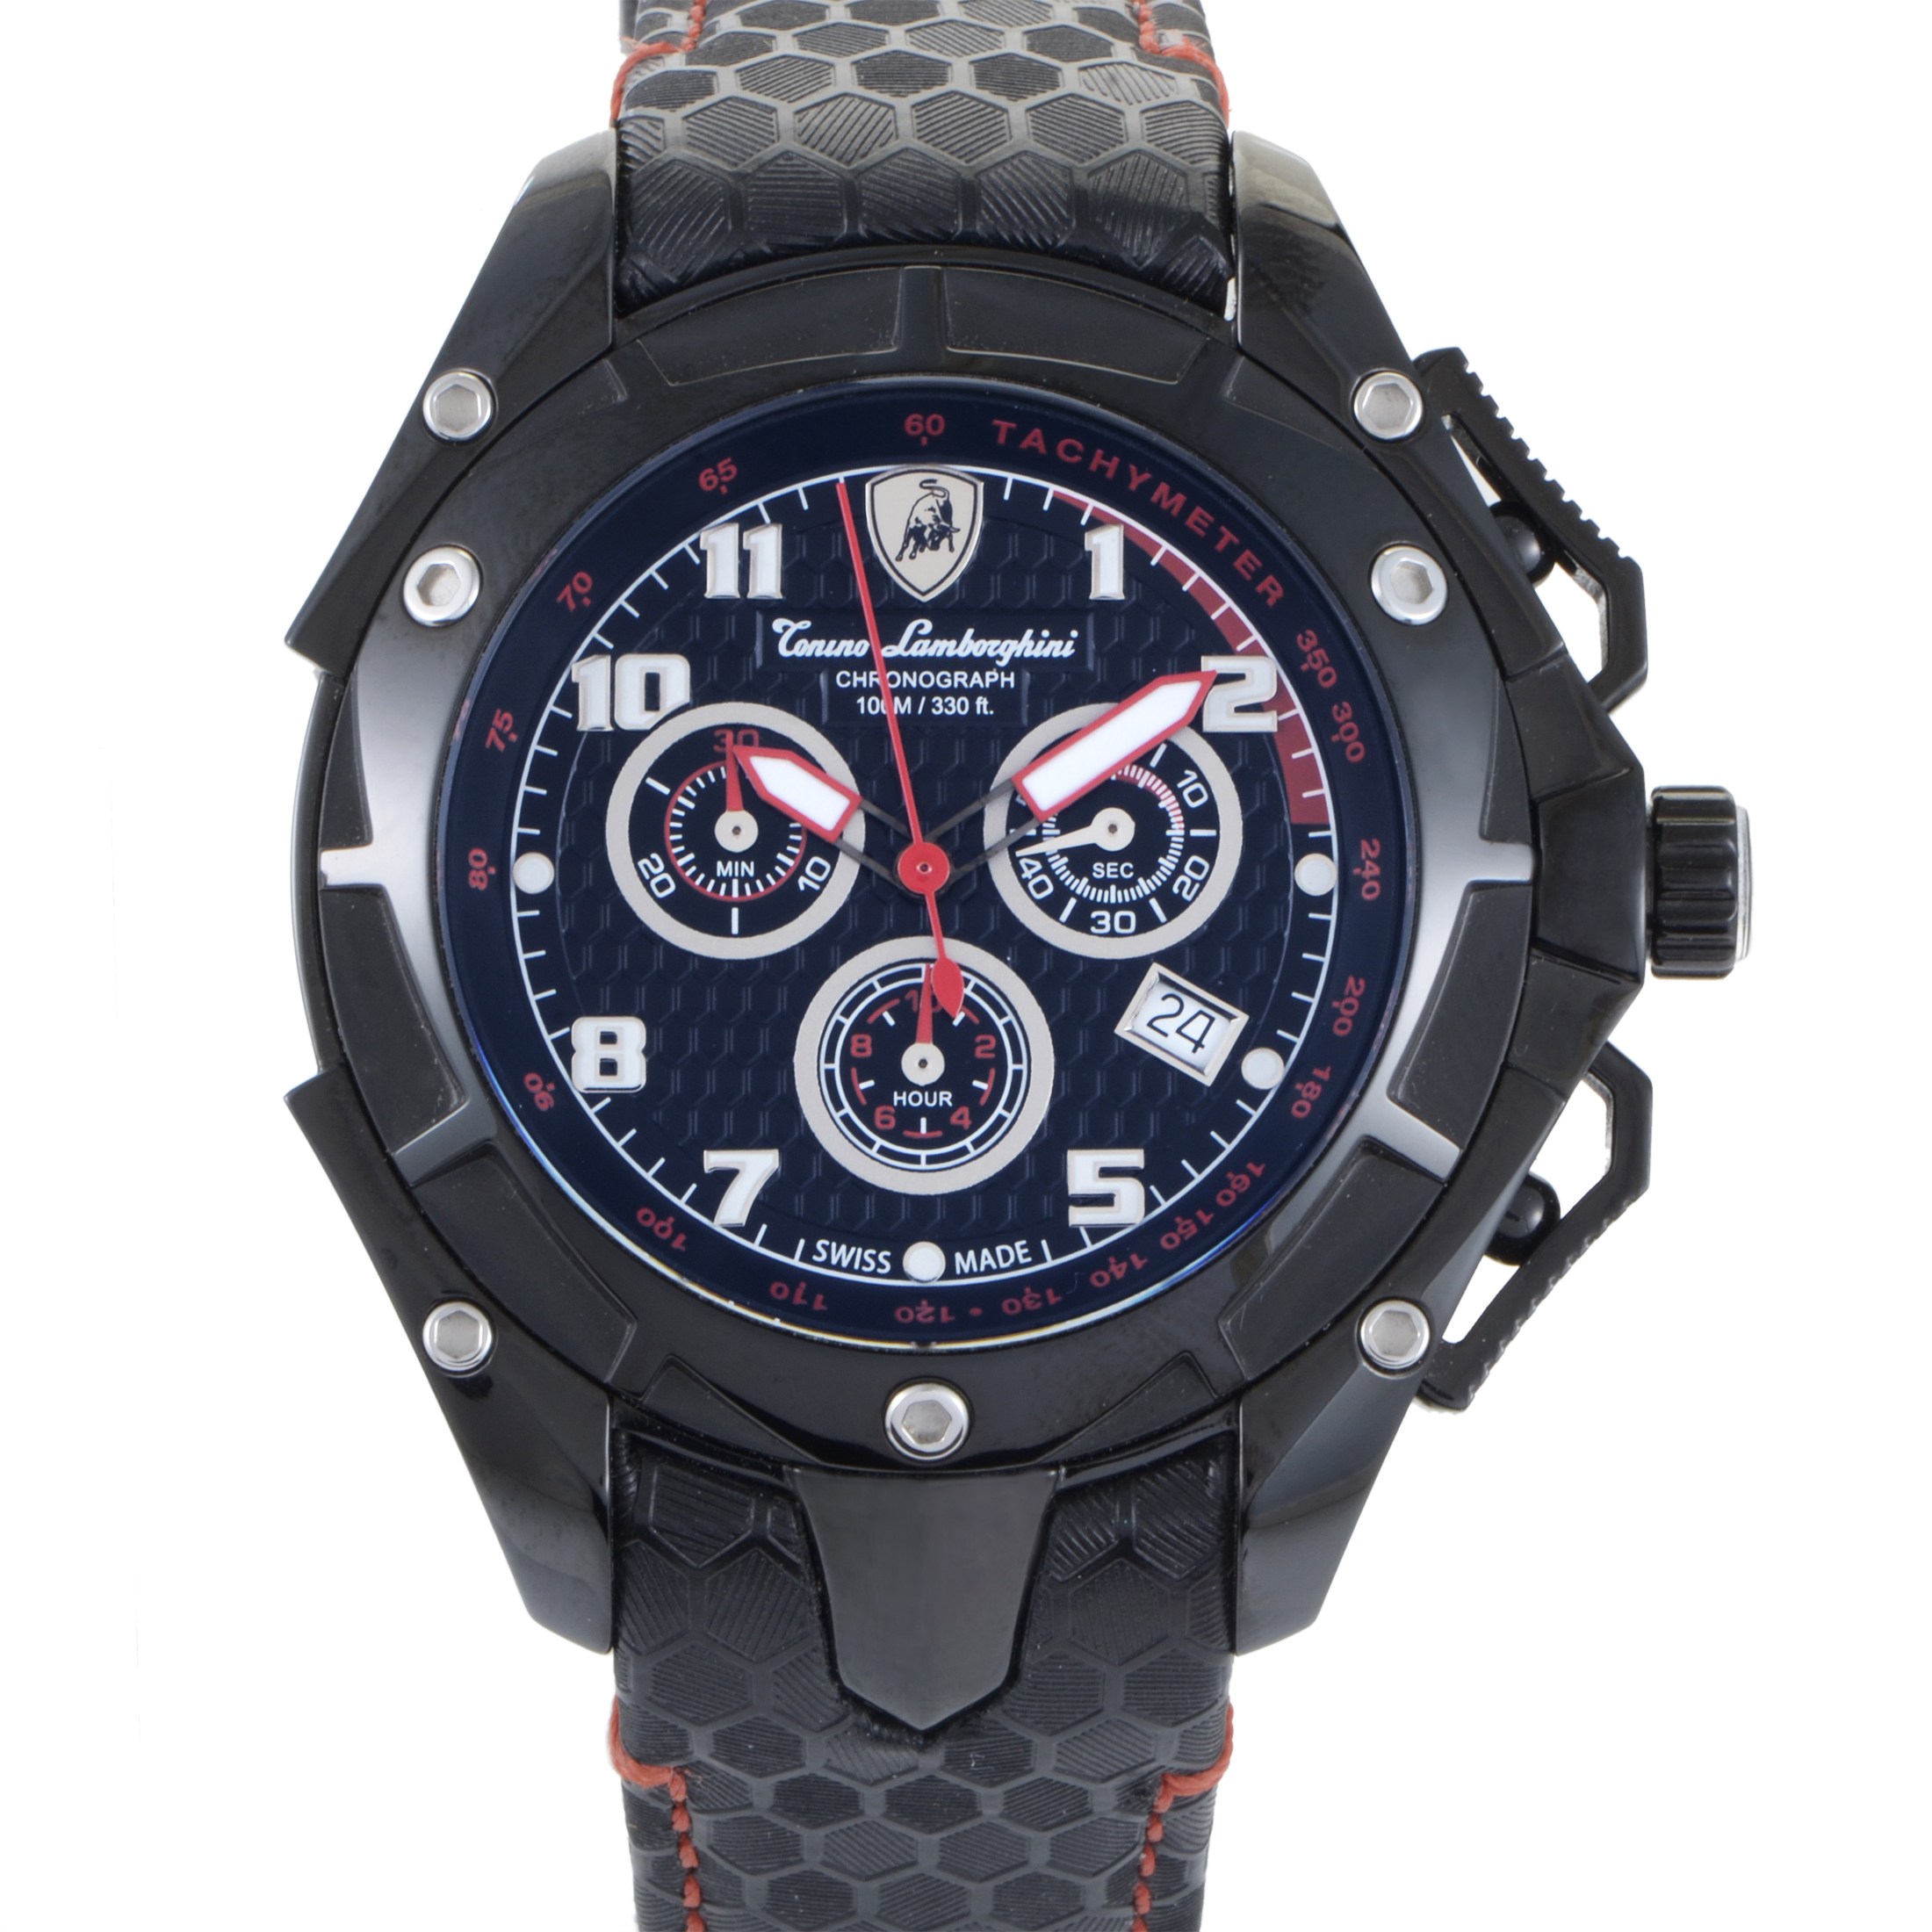 Spyder Men's Quartz Chronograph Watch 3400 3403